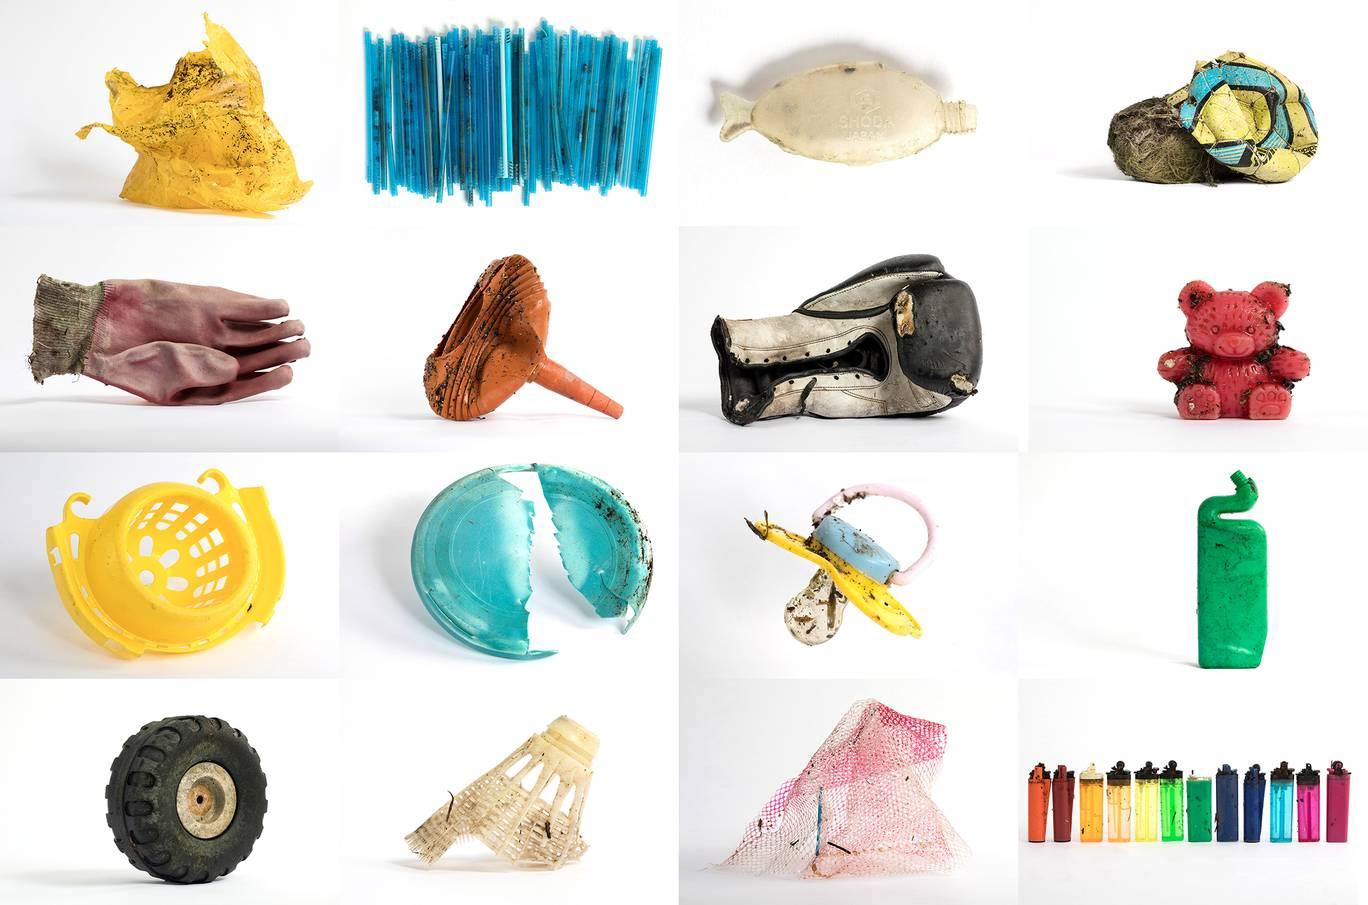 European Union to ban single-use plastics in bid to tackle pollution